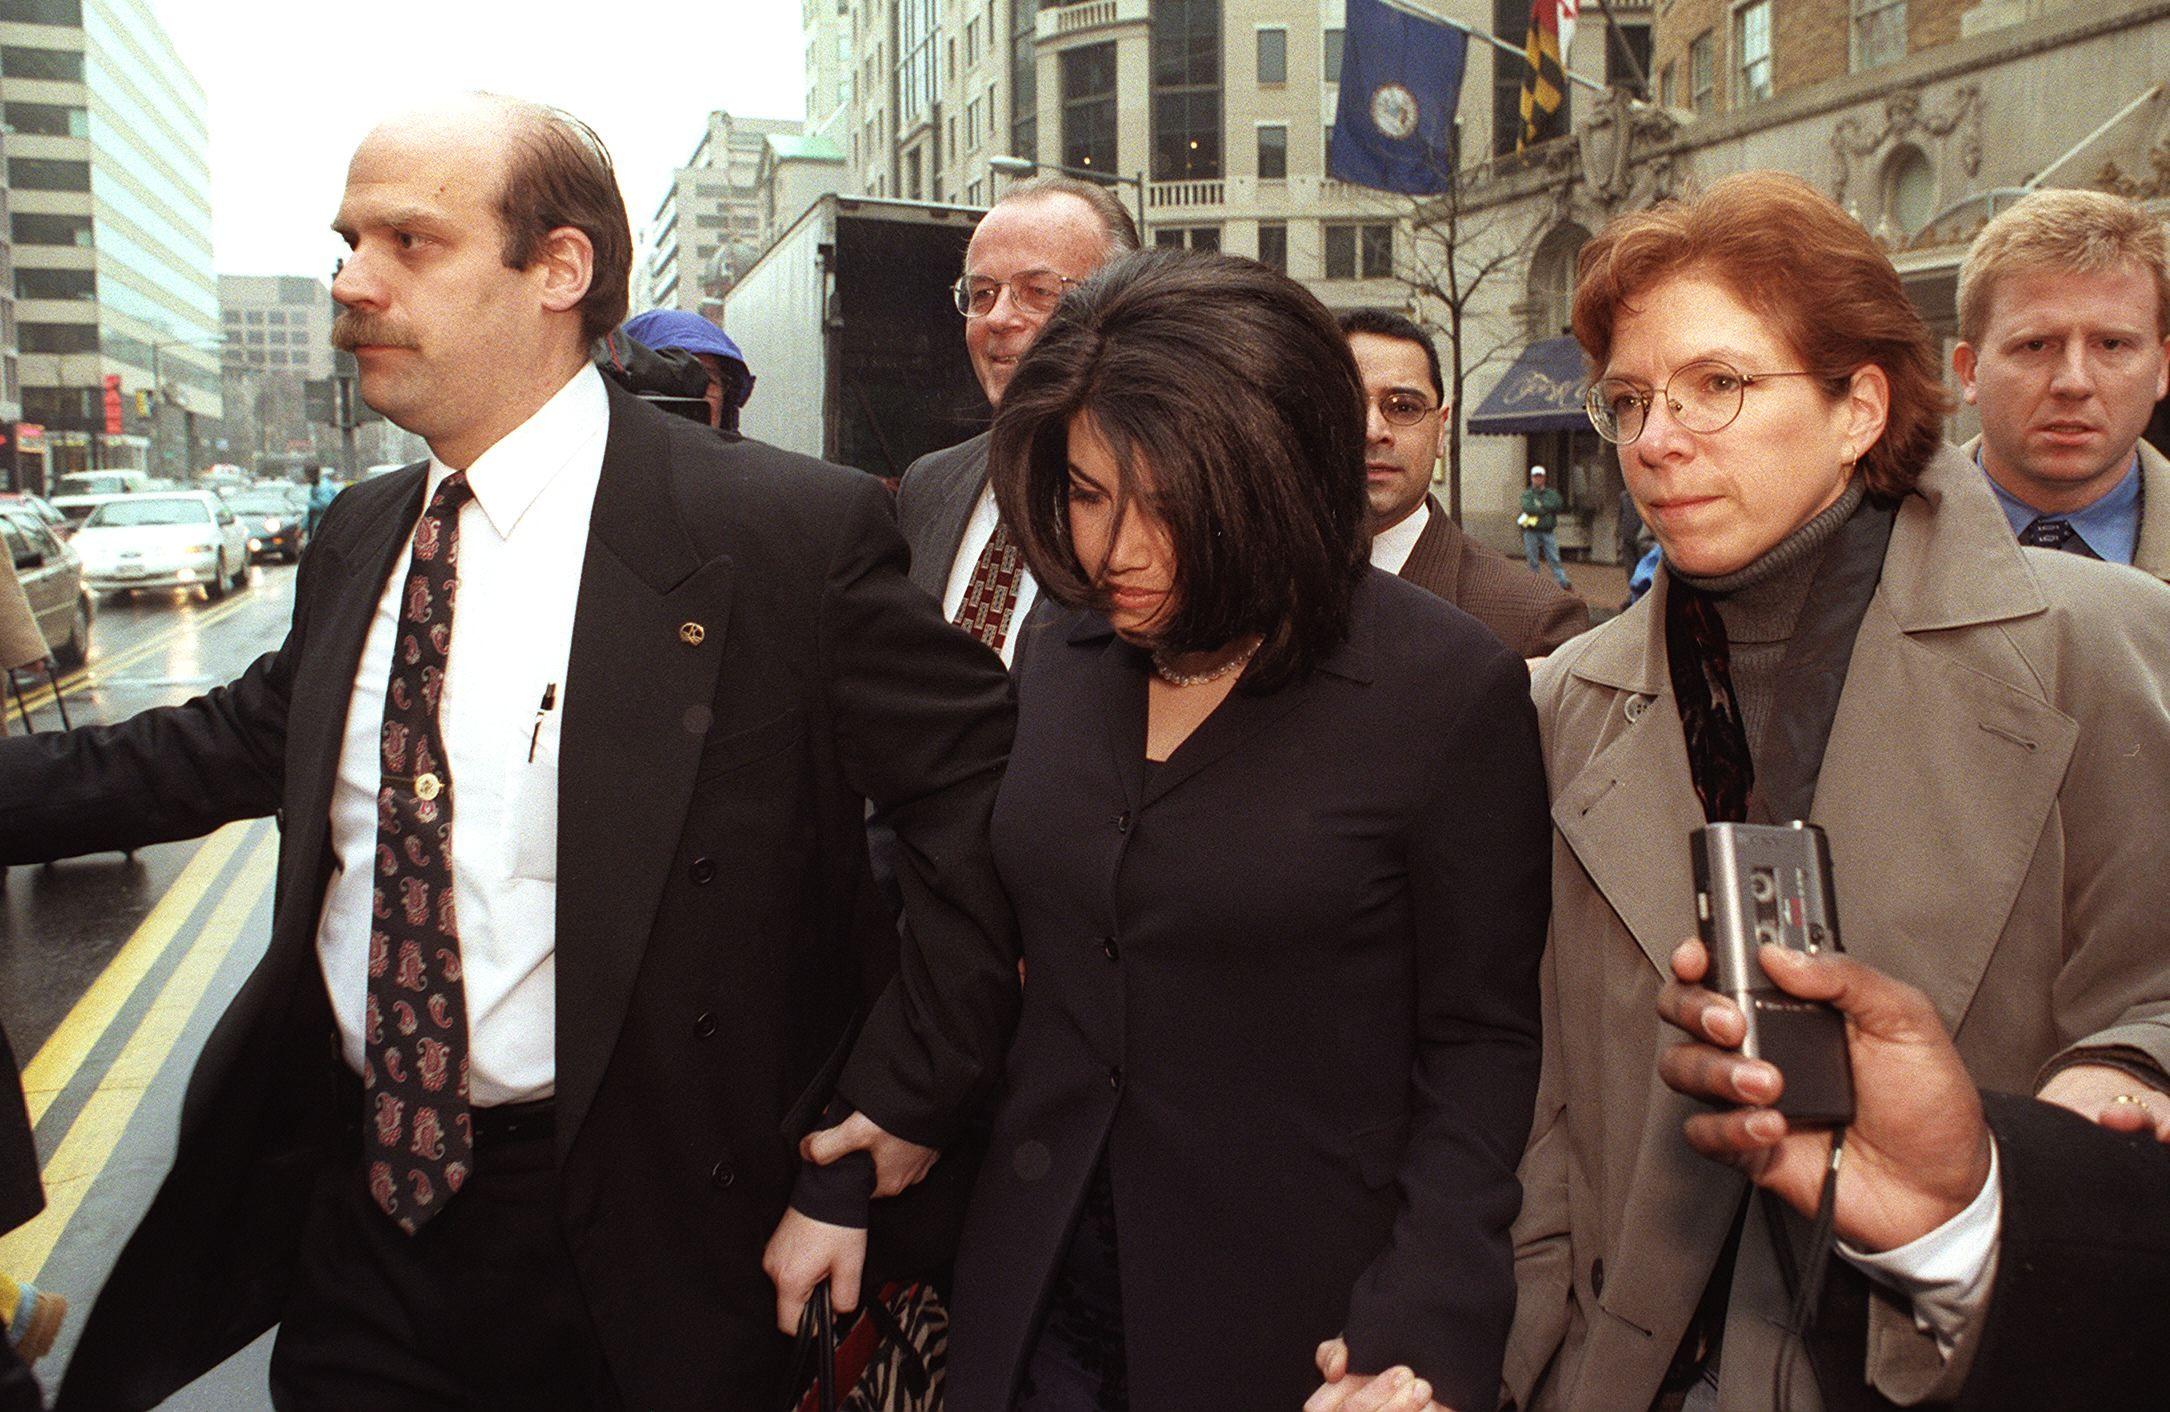 Former White House intern Monica Lewinsky(C) is es